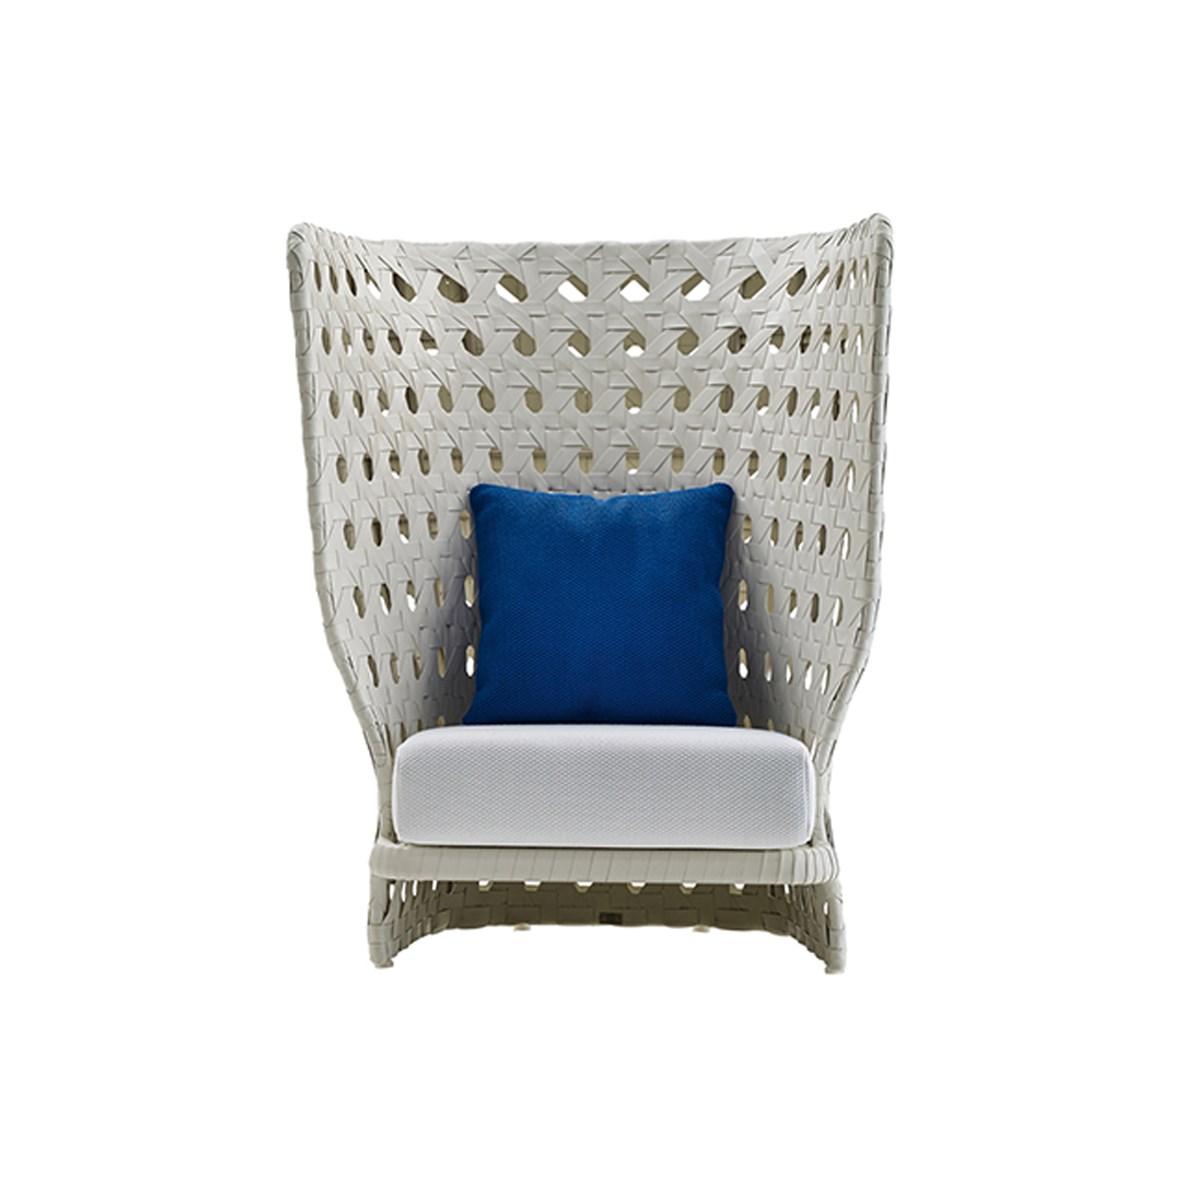 B&B-Italia-Outdoor-Patricia-Urquiola-Canasta-Outdoor-Armchair-Matisse-1